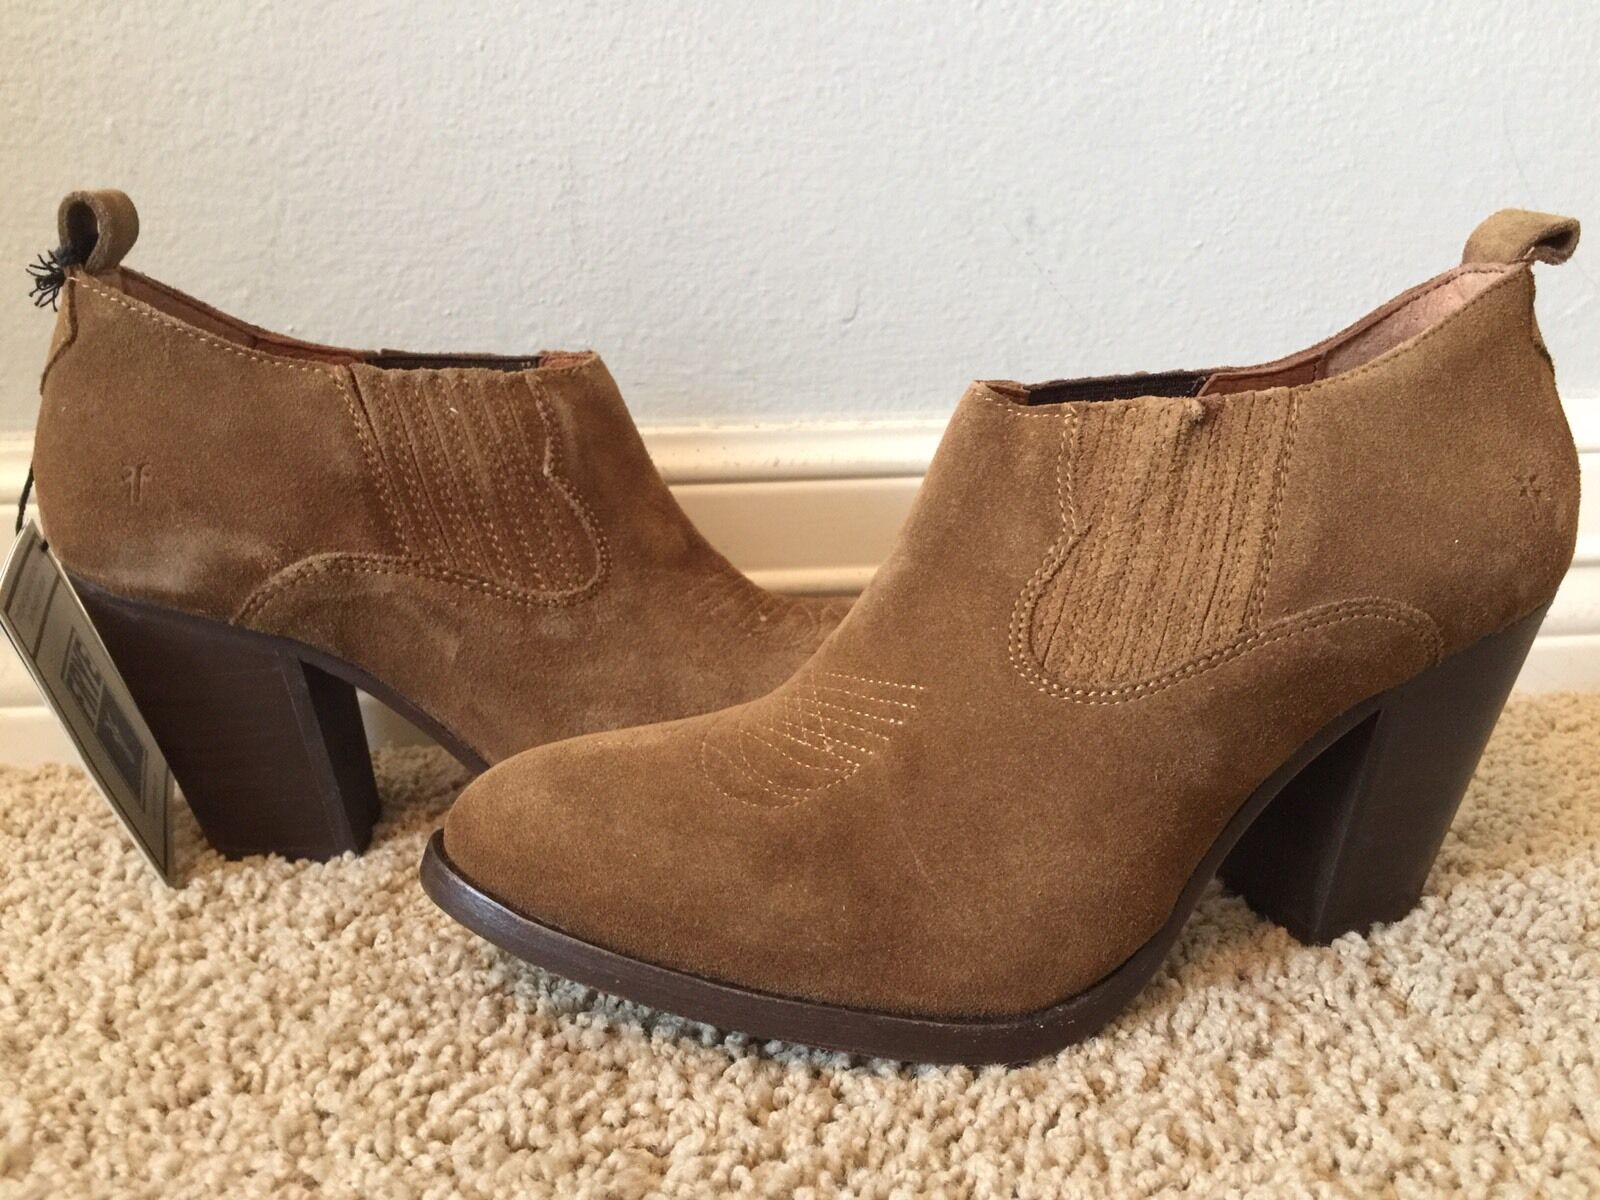 New FRYE Ilana Short Cashew Brown Leather Suede Boots Shooties Sz 9.5 278